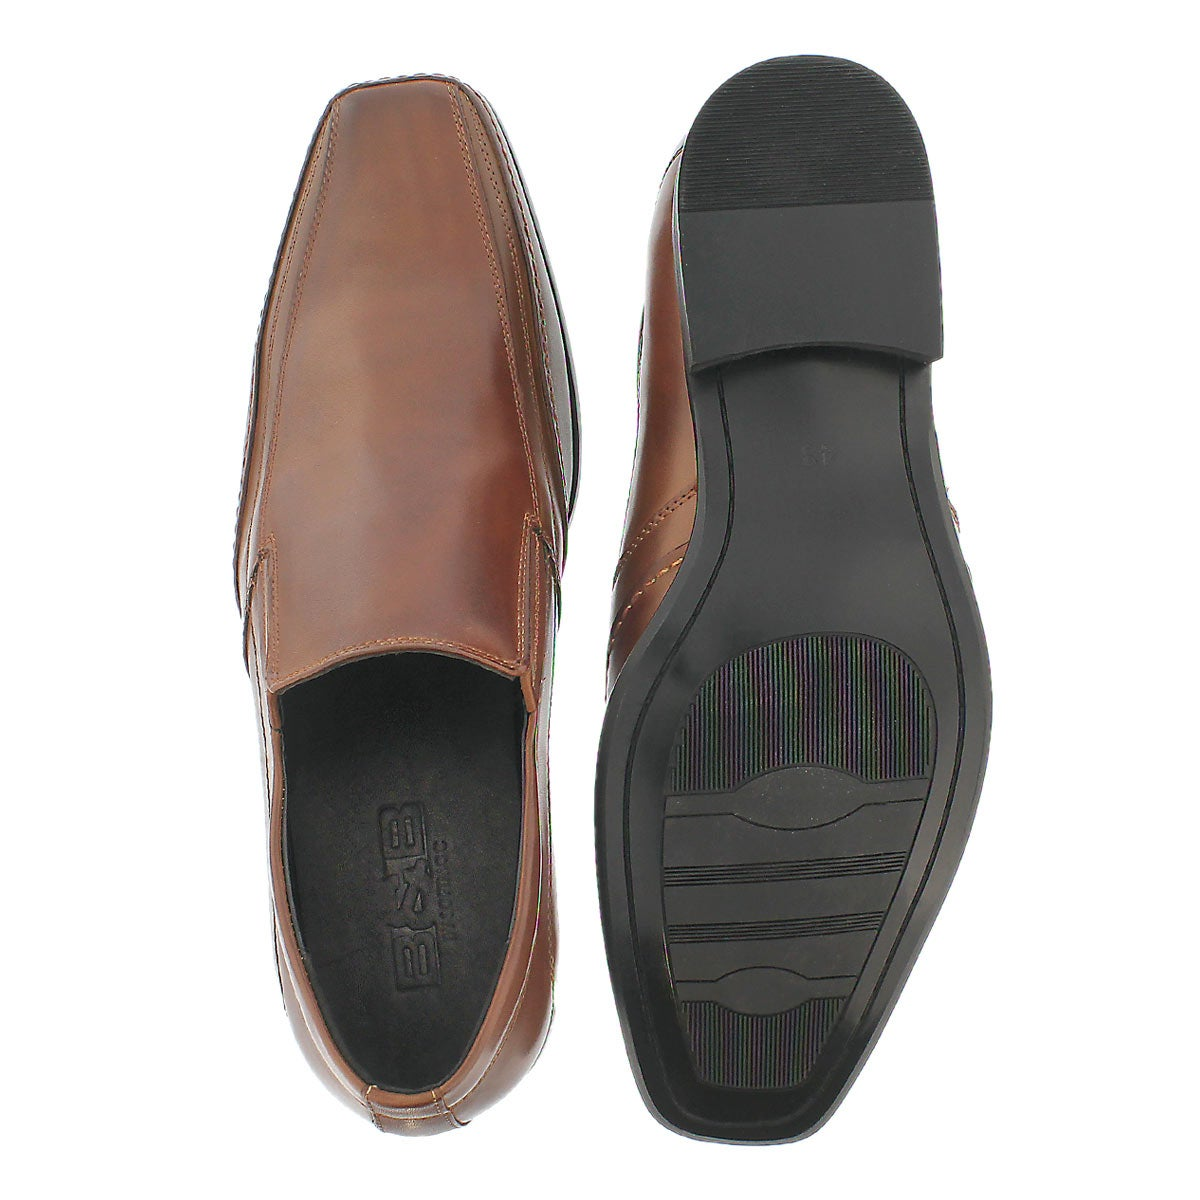 softmoc s justin 2 cognac slip on dress shoes